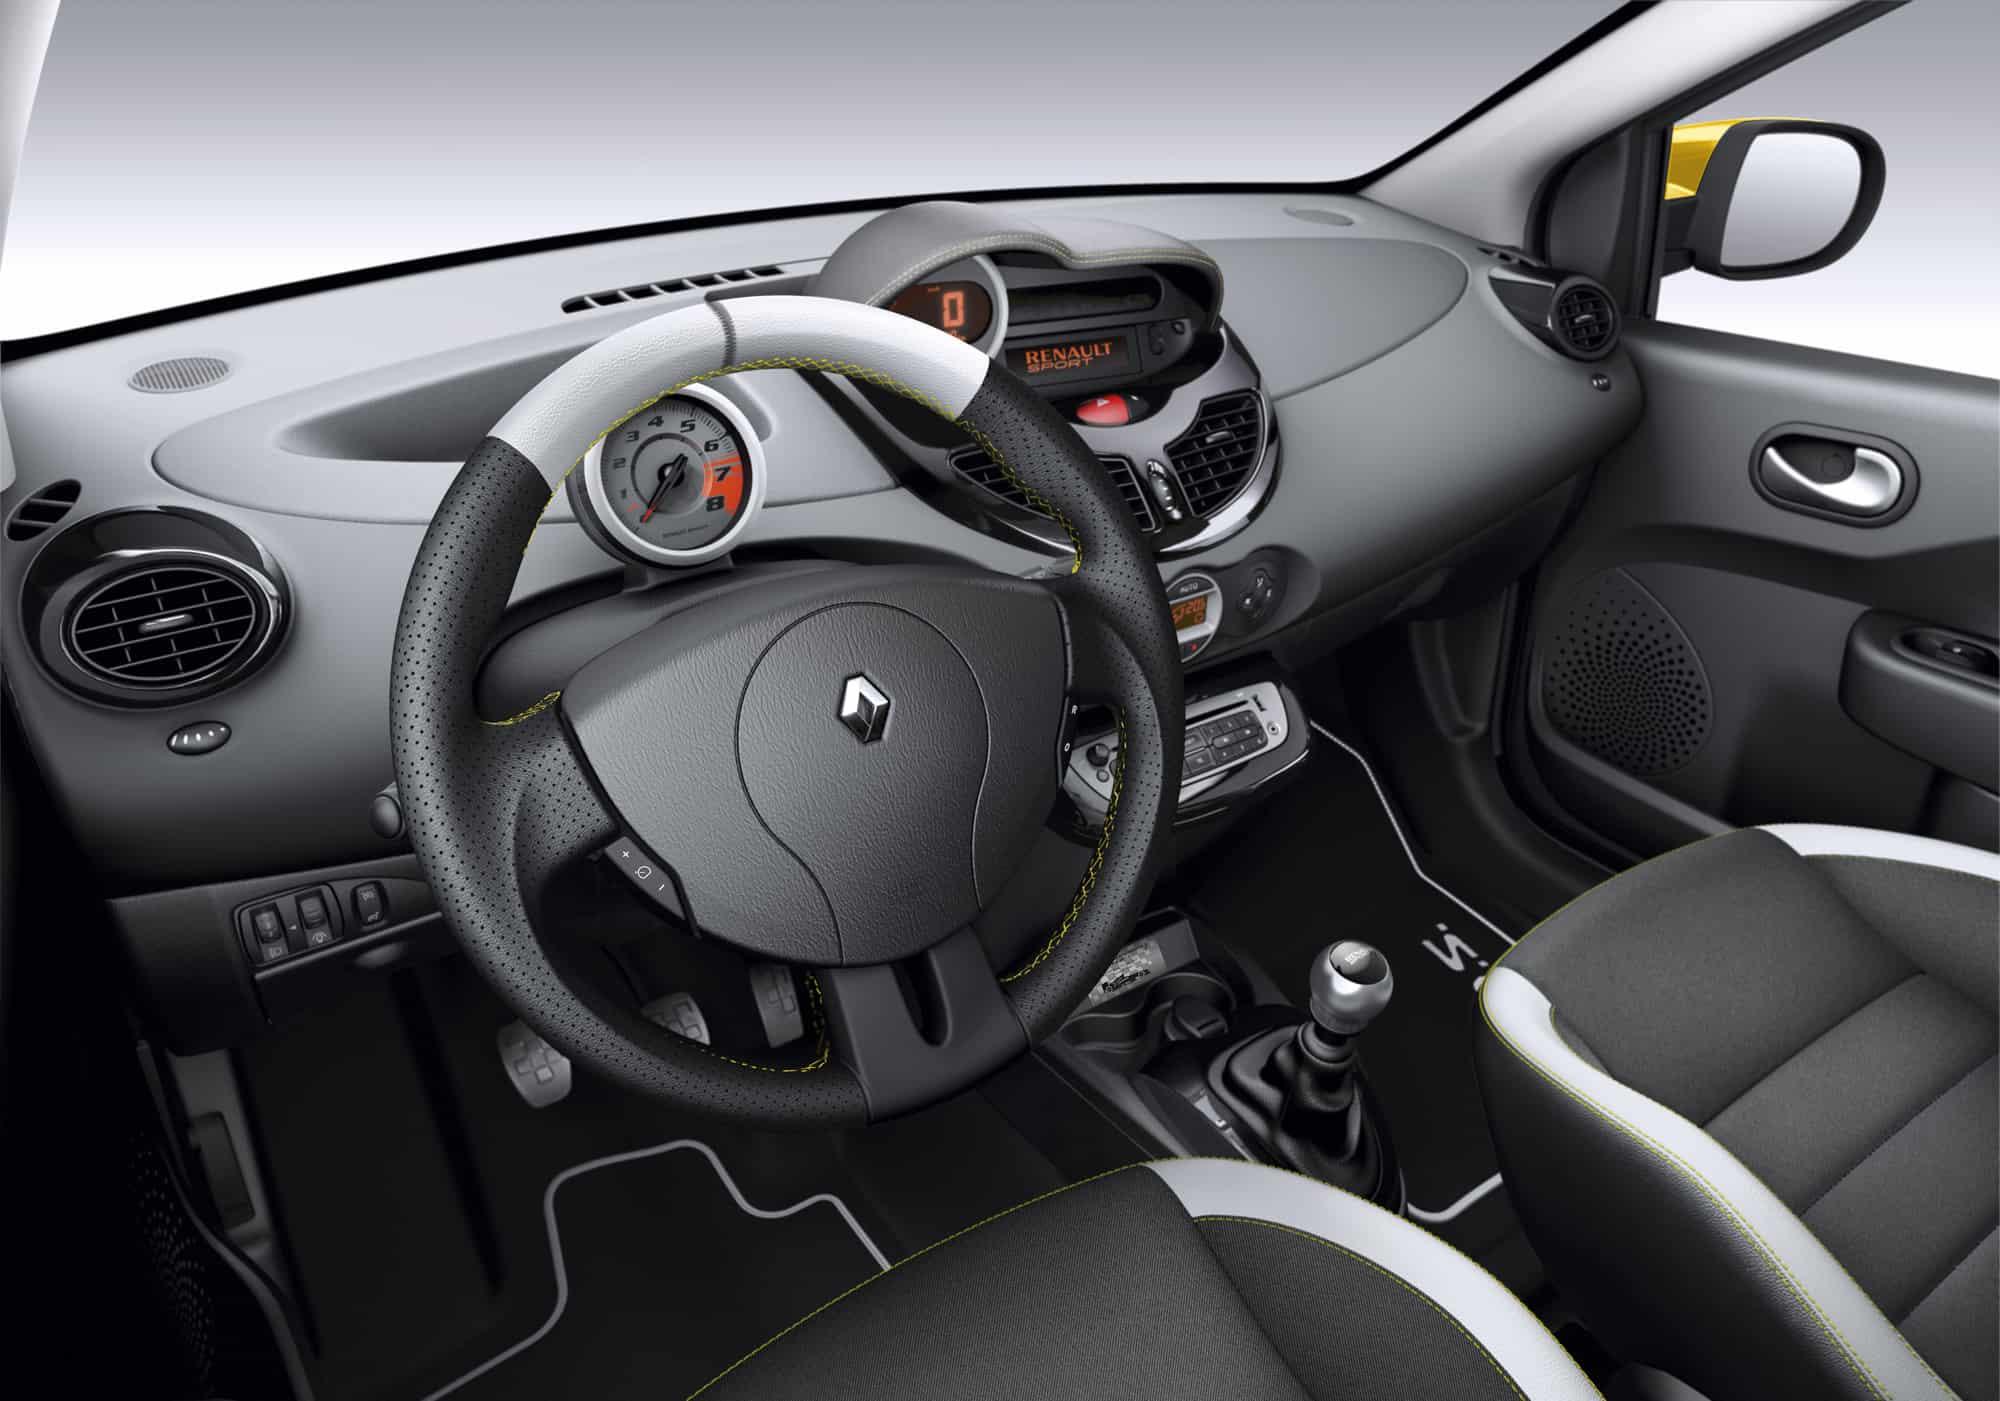 https://www.carmart.ch/wp-content/uploads/2013/08/Renault_32406_1_6.jpg